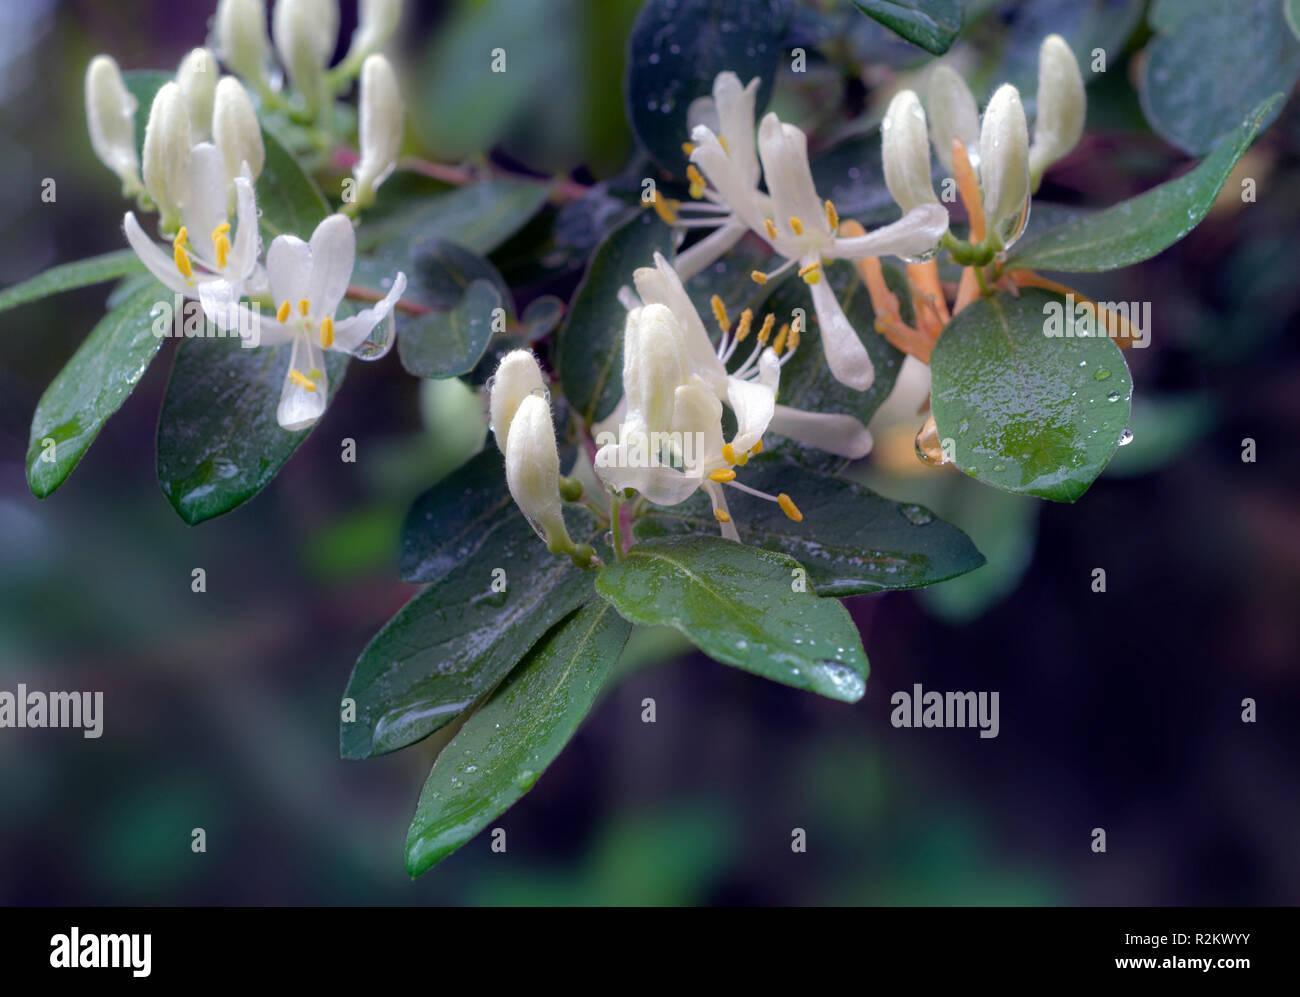 Closeup of honeysuckle blossoms - Stock Image